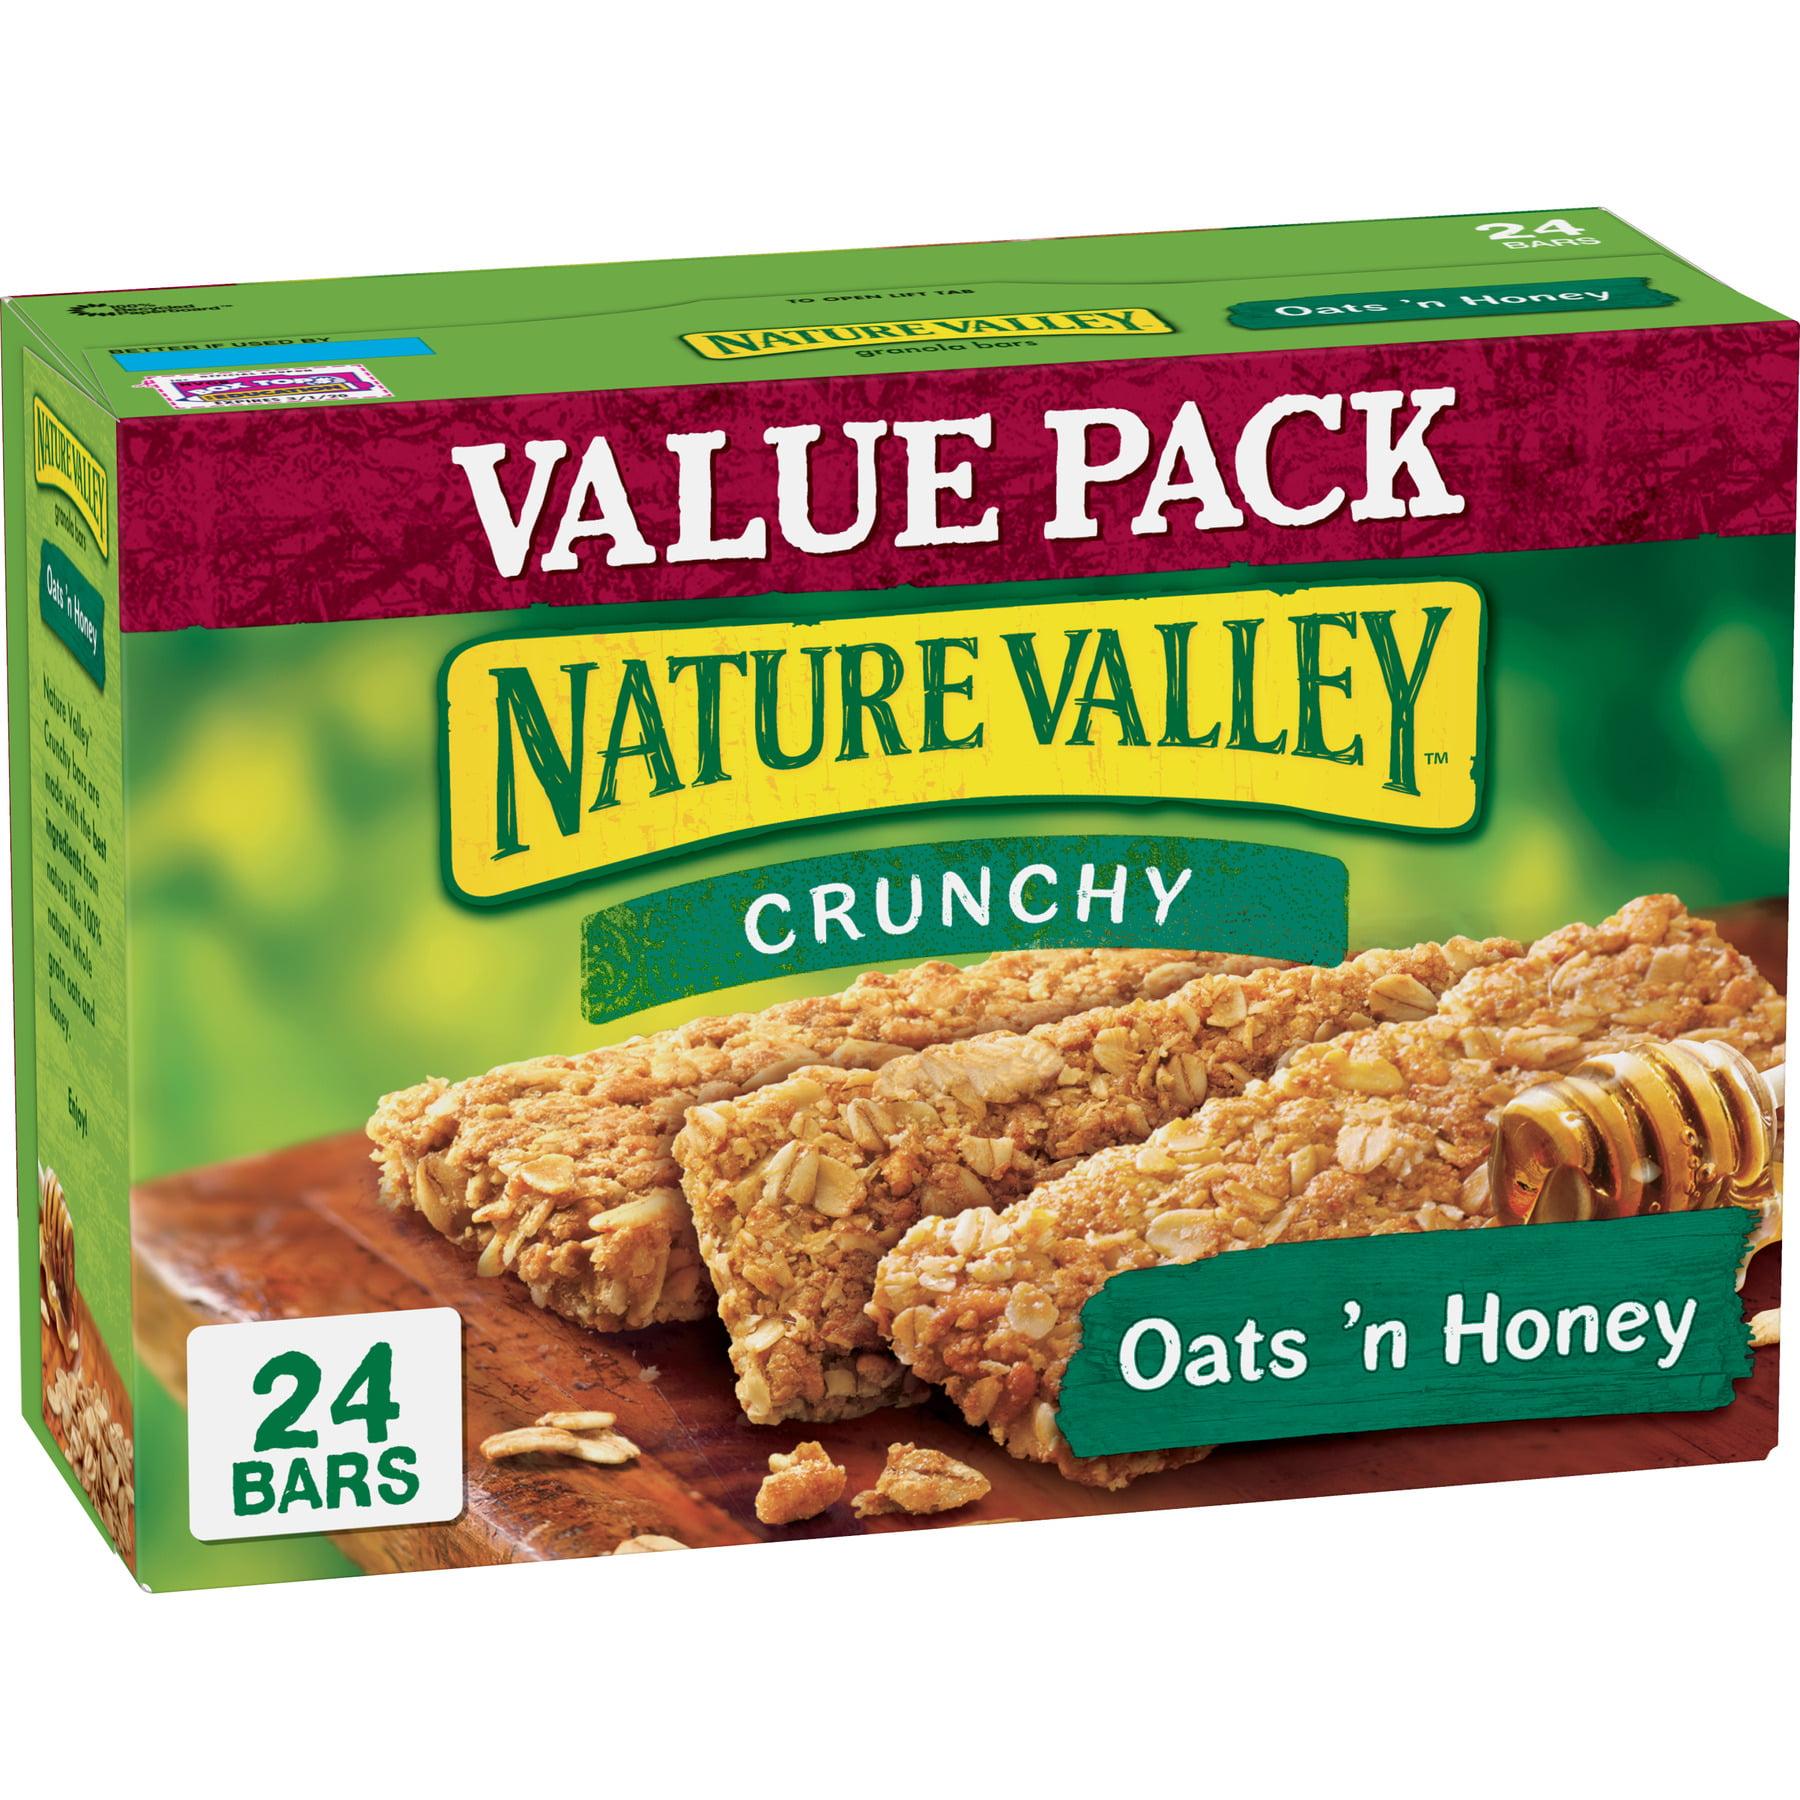 Nature Valley Granola Bars Crunchy Oats 'n Honey 24 Bars